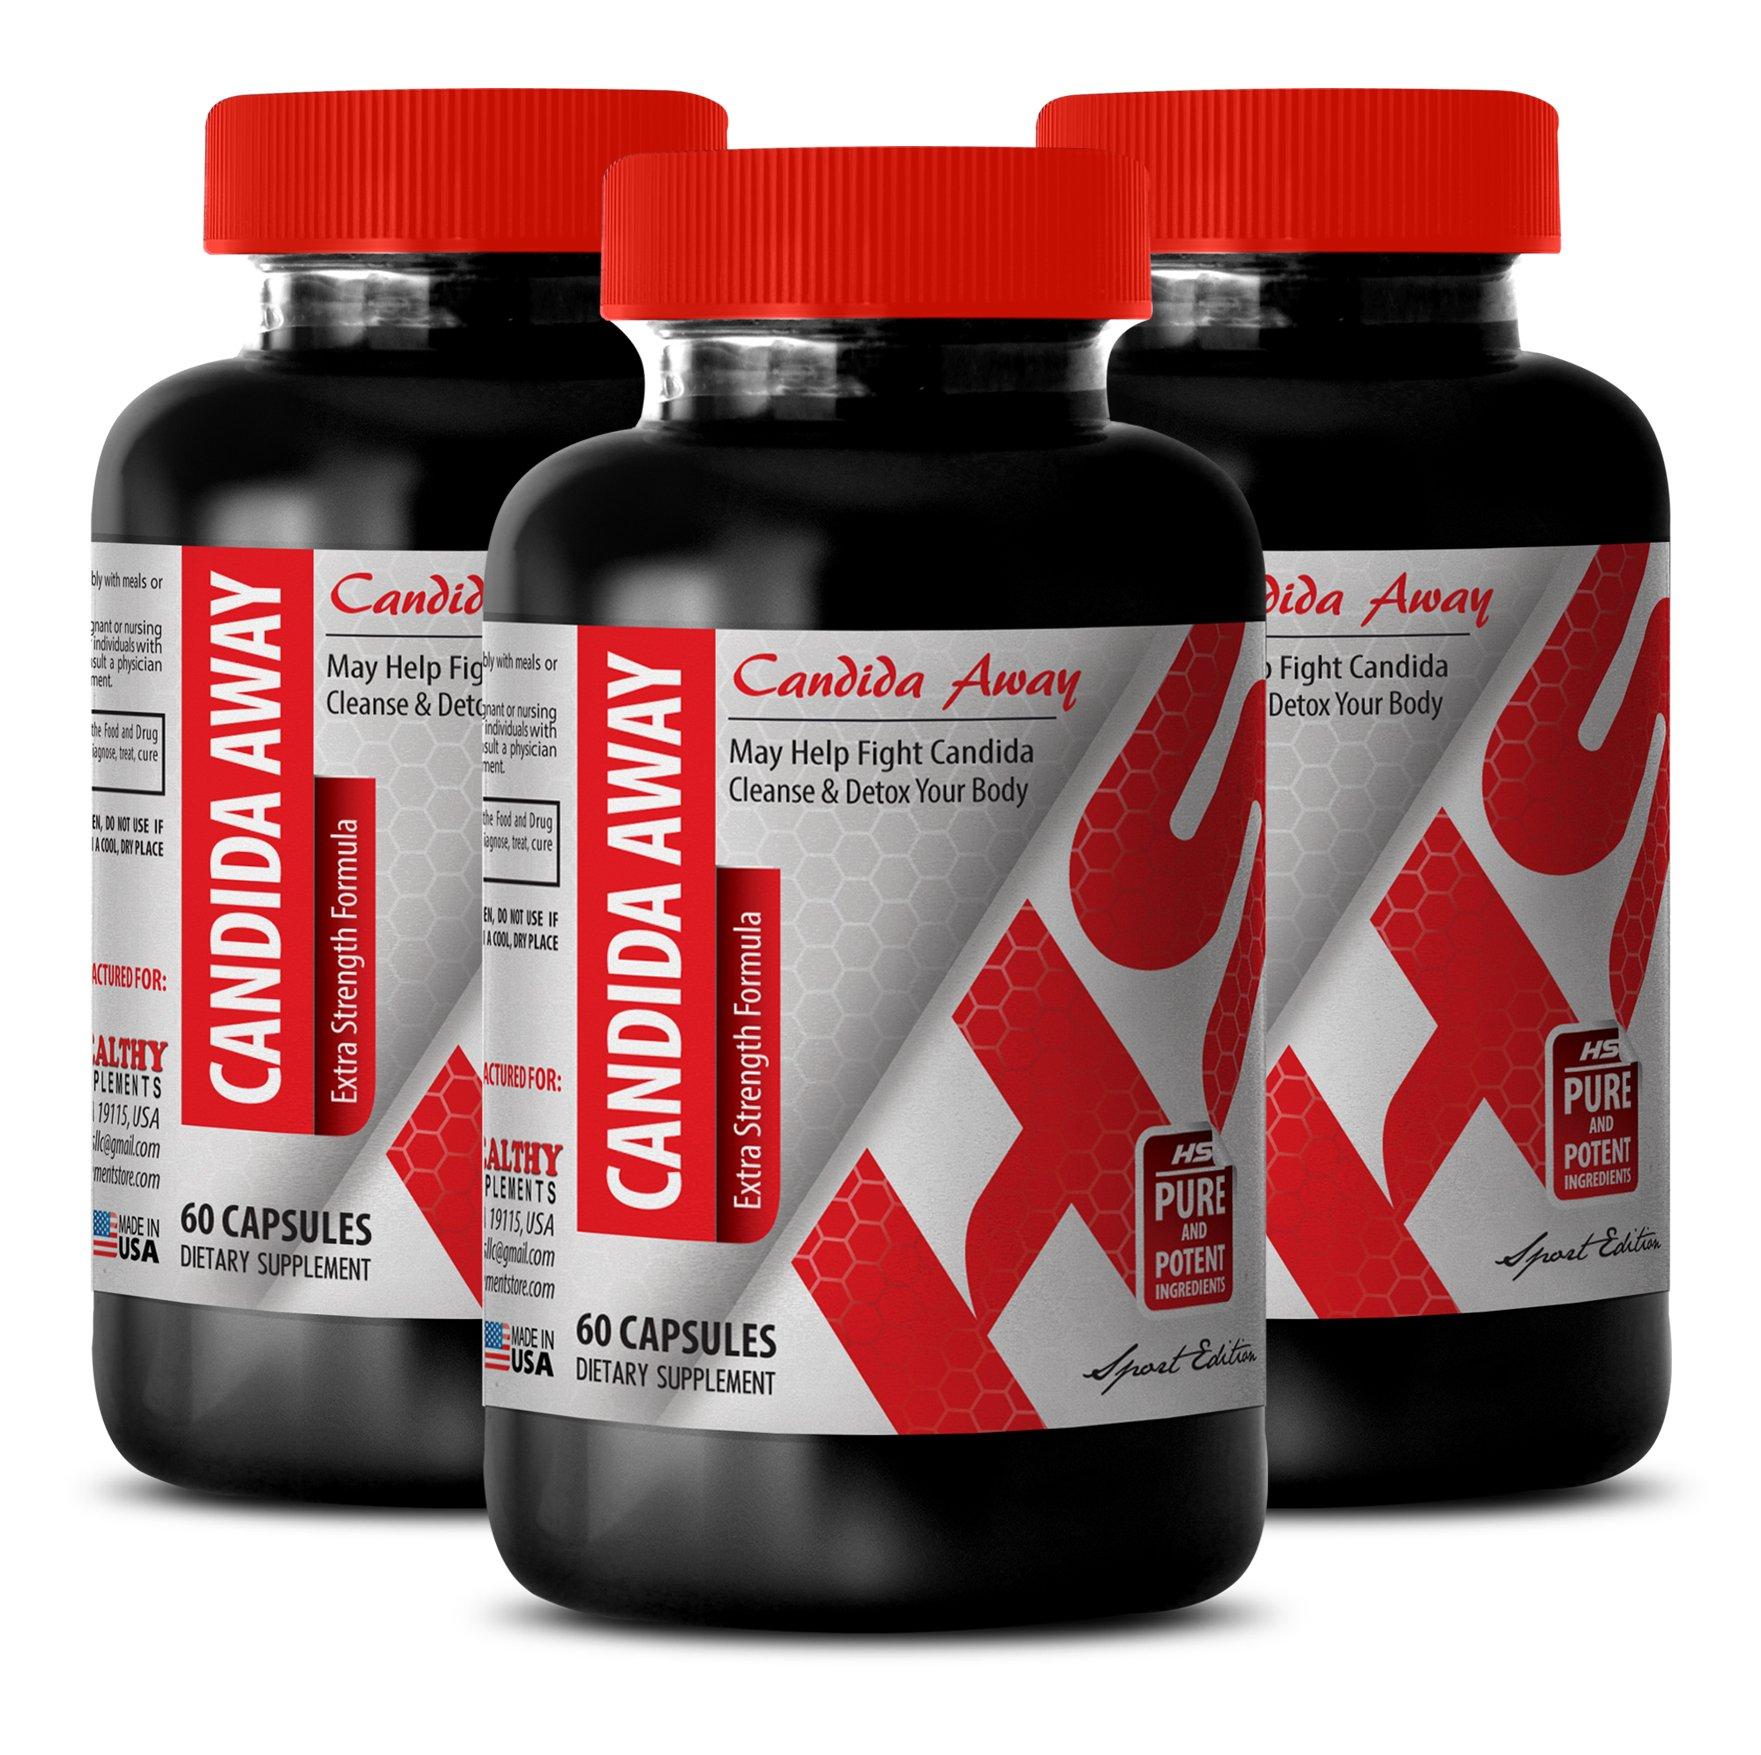 Wormwood black walnut capsules - CANDIDA AWAY COMPLEX 1175 MG - promote endurance (3 Bottles)